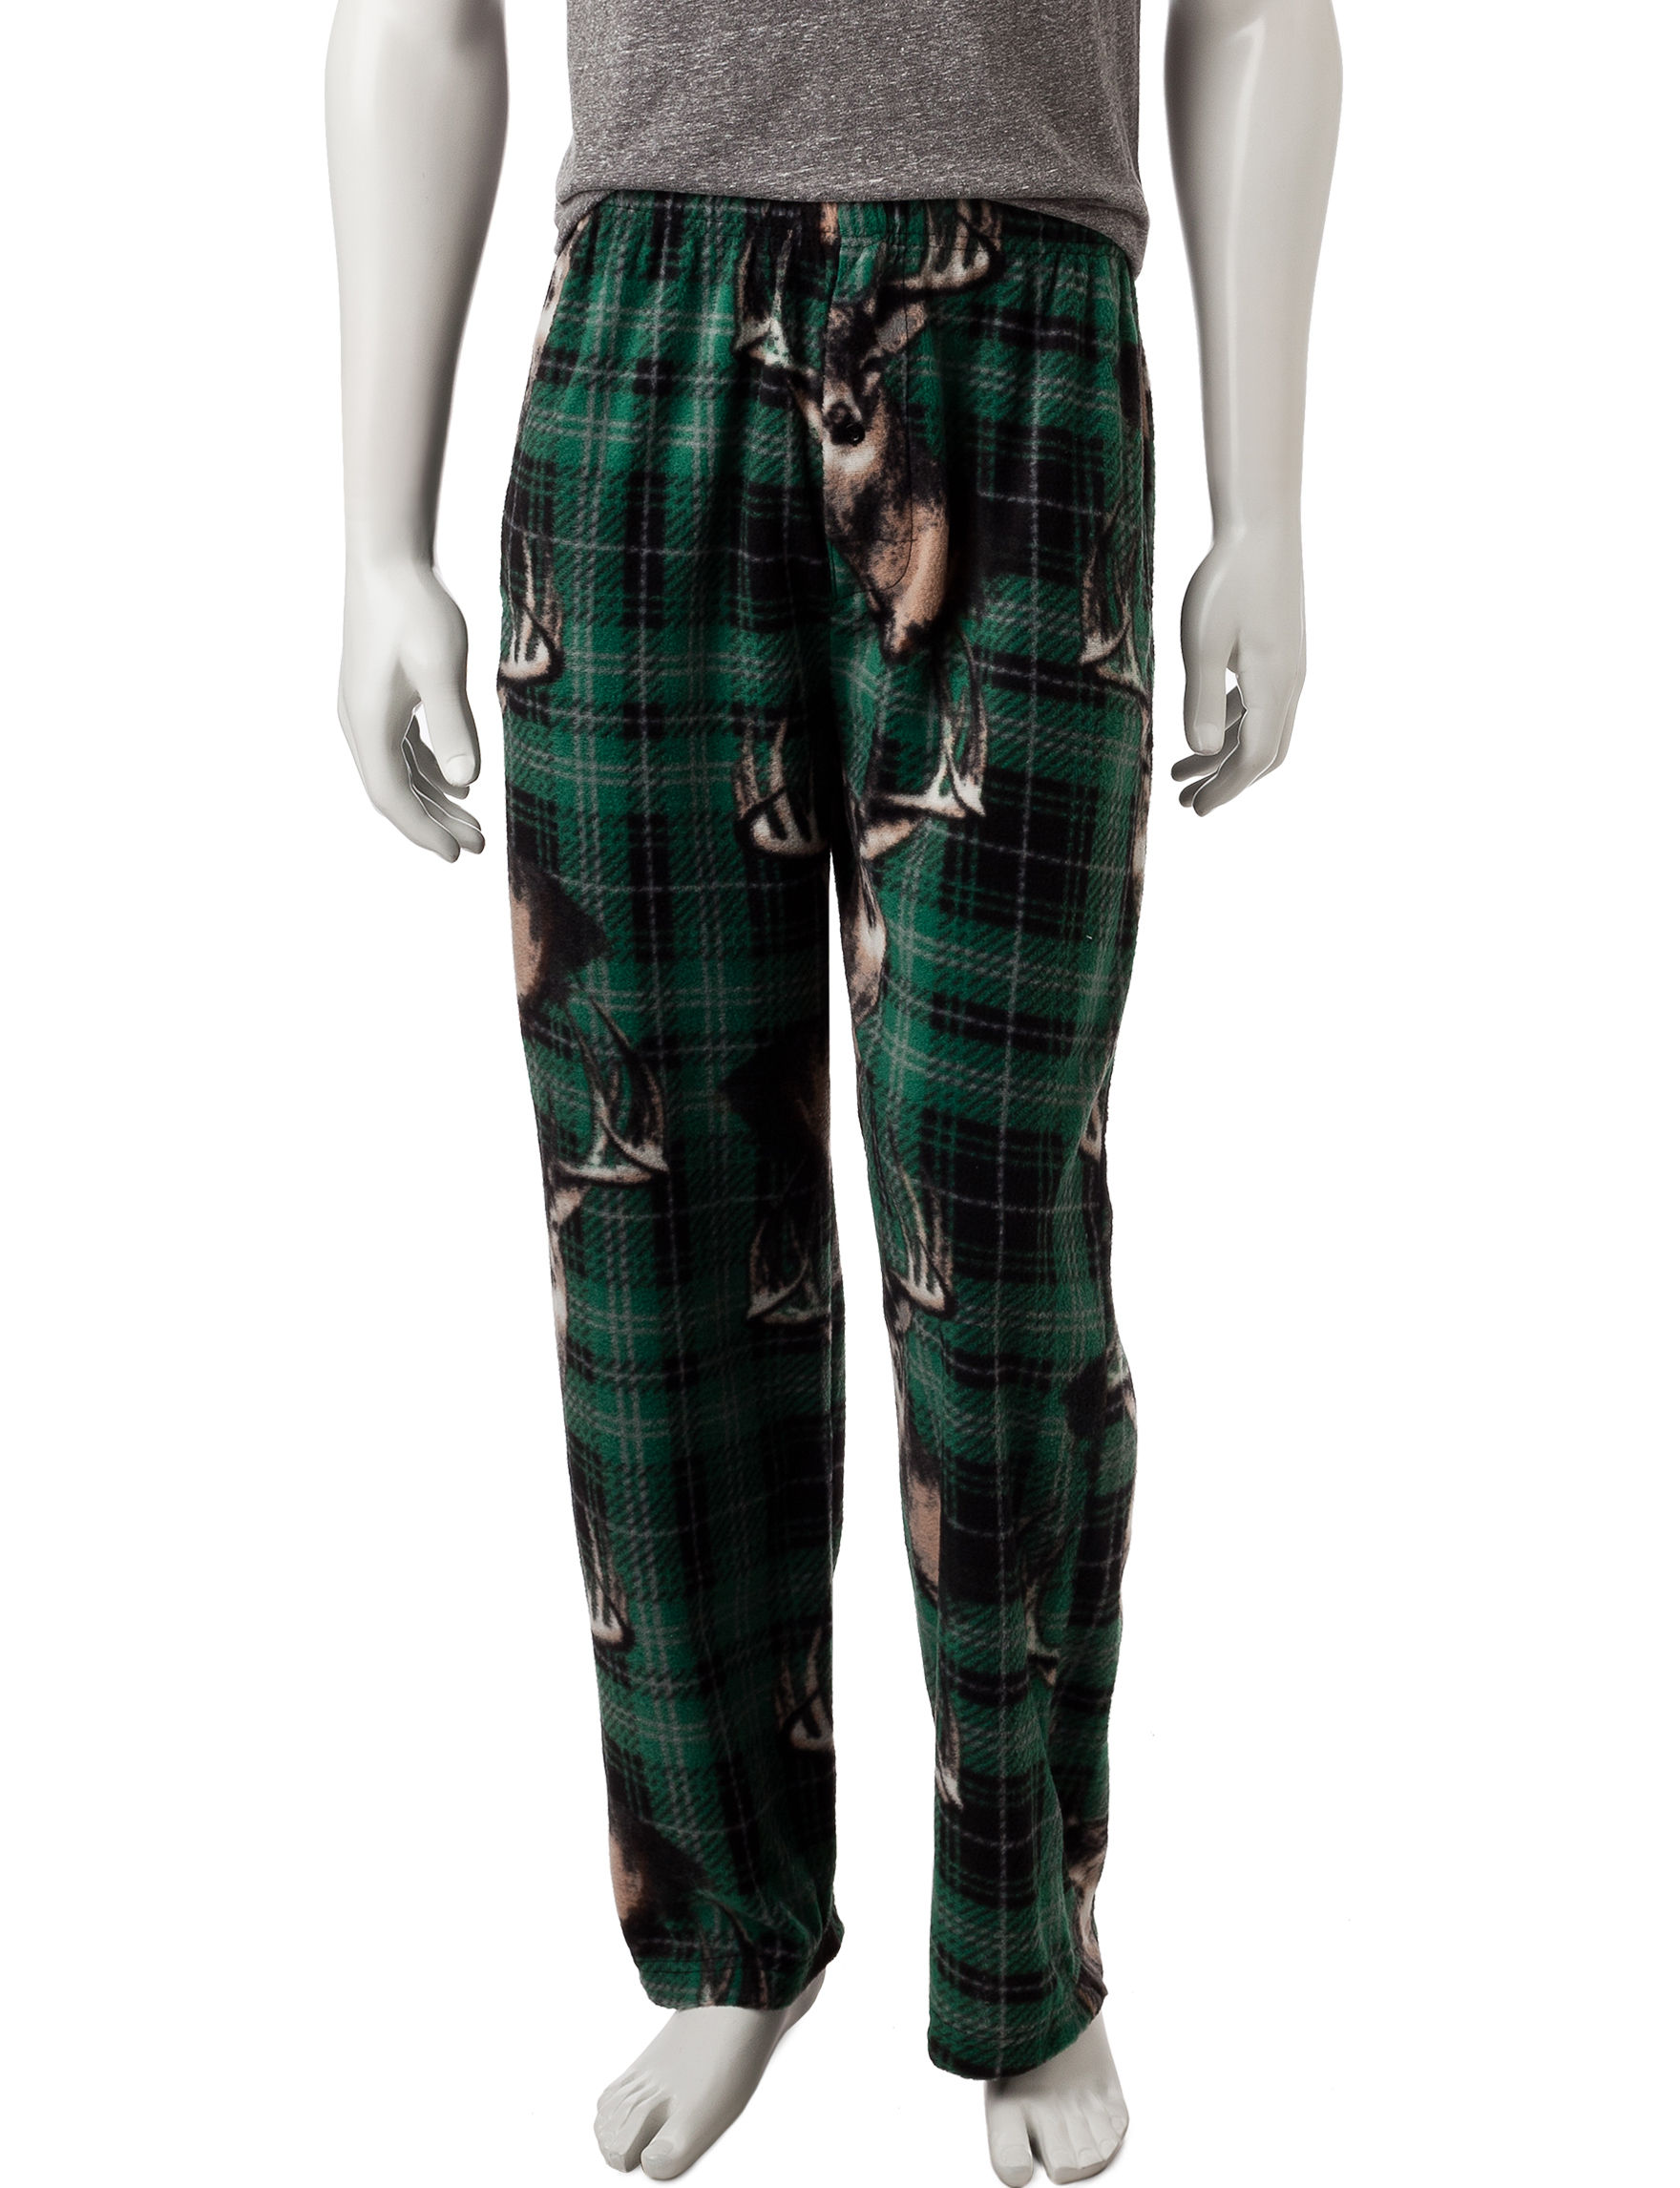 Fun Boxer Green Pajama Bottoms